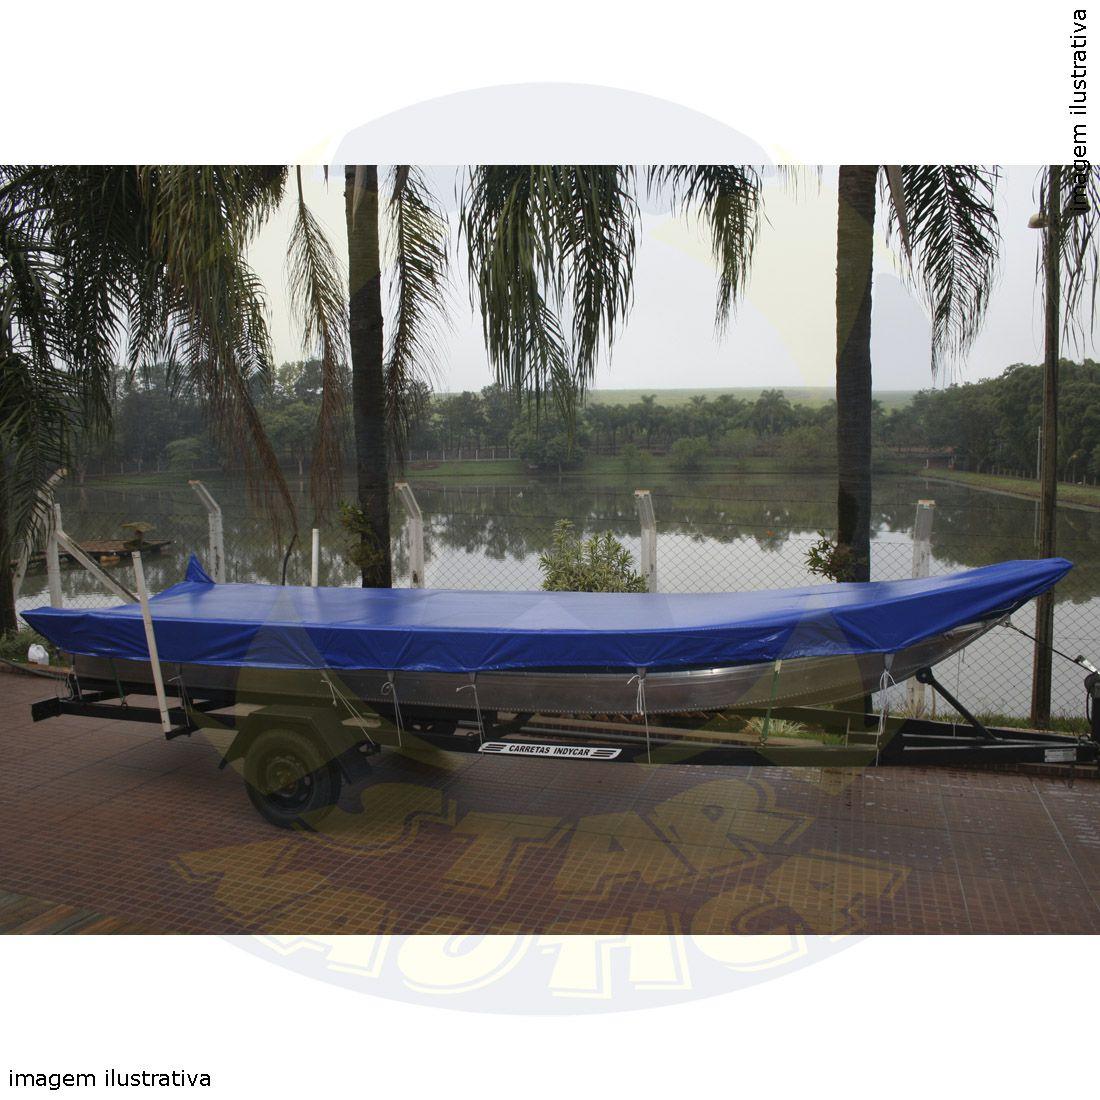 Capa Lona de Cobertura Barco Marujo 500 Lona Poliéster